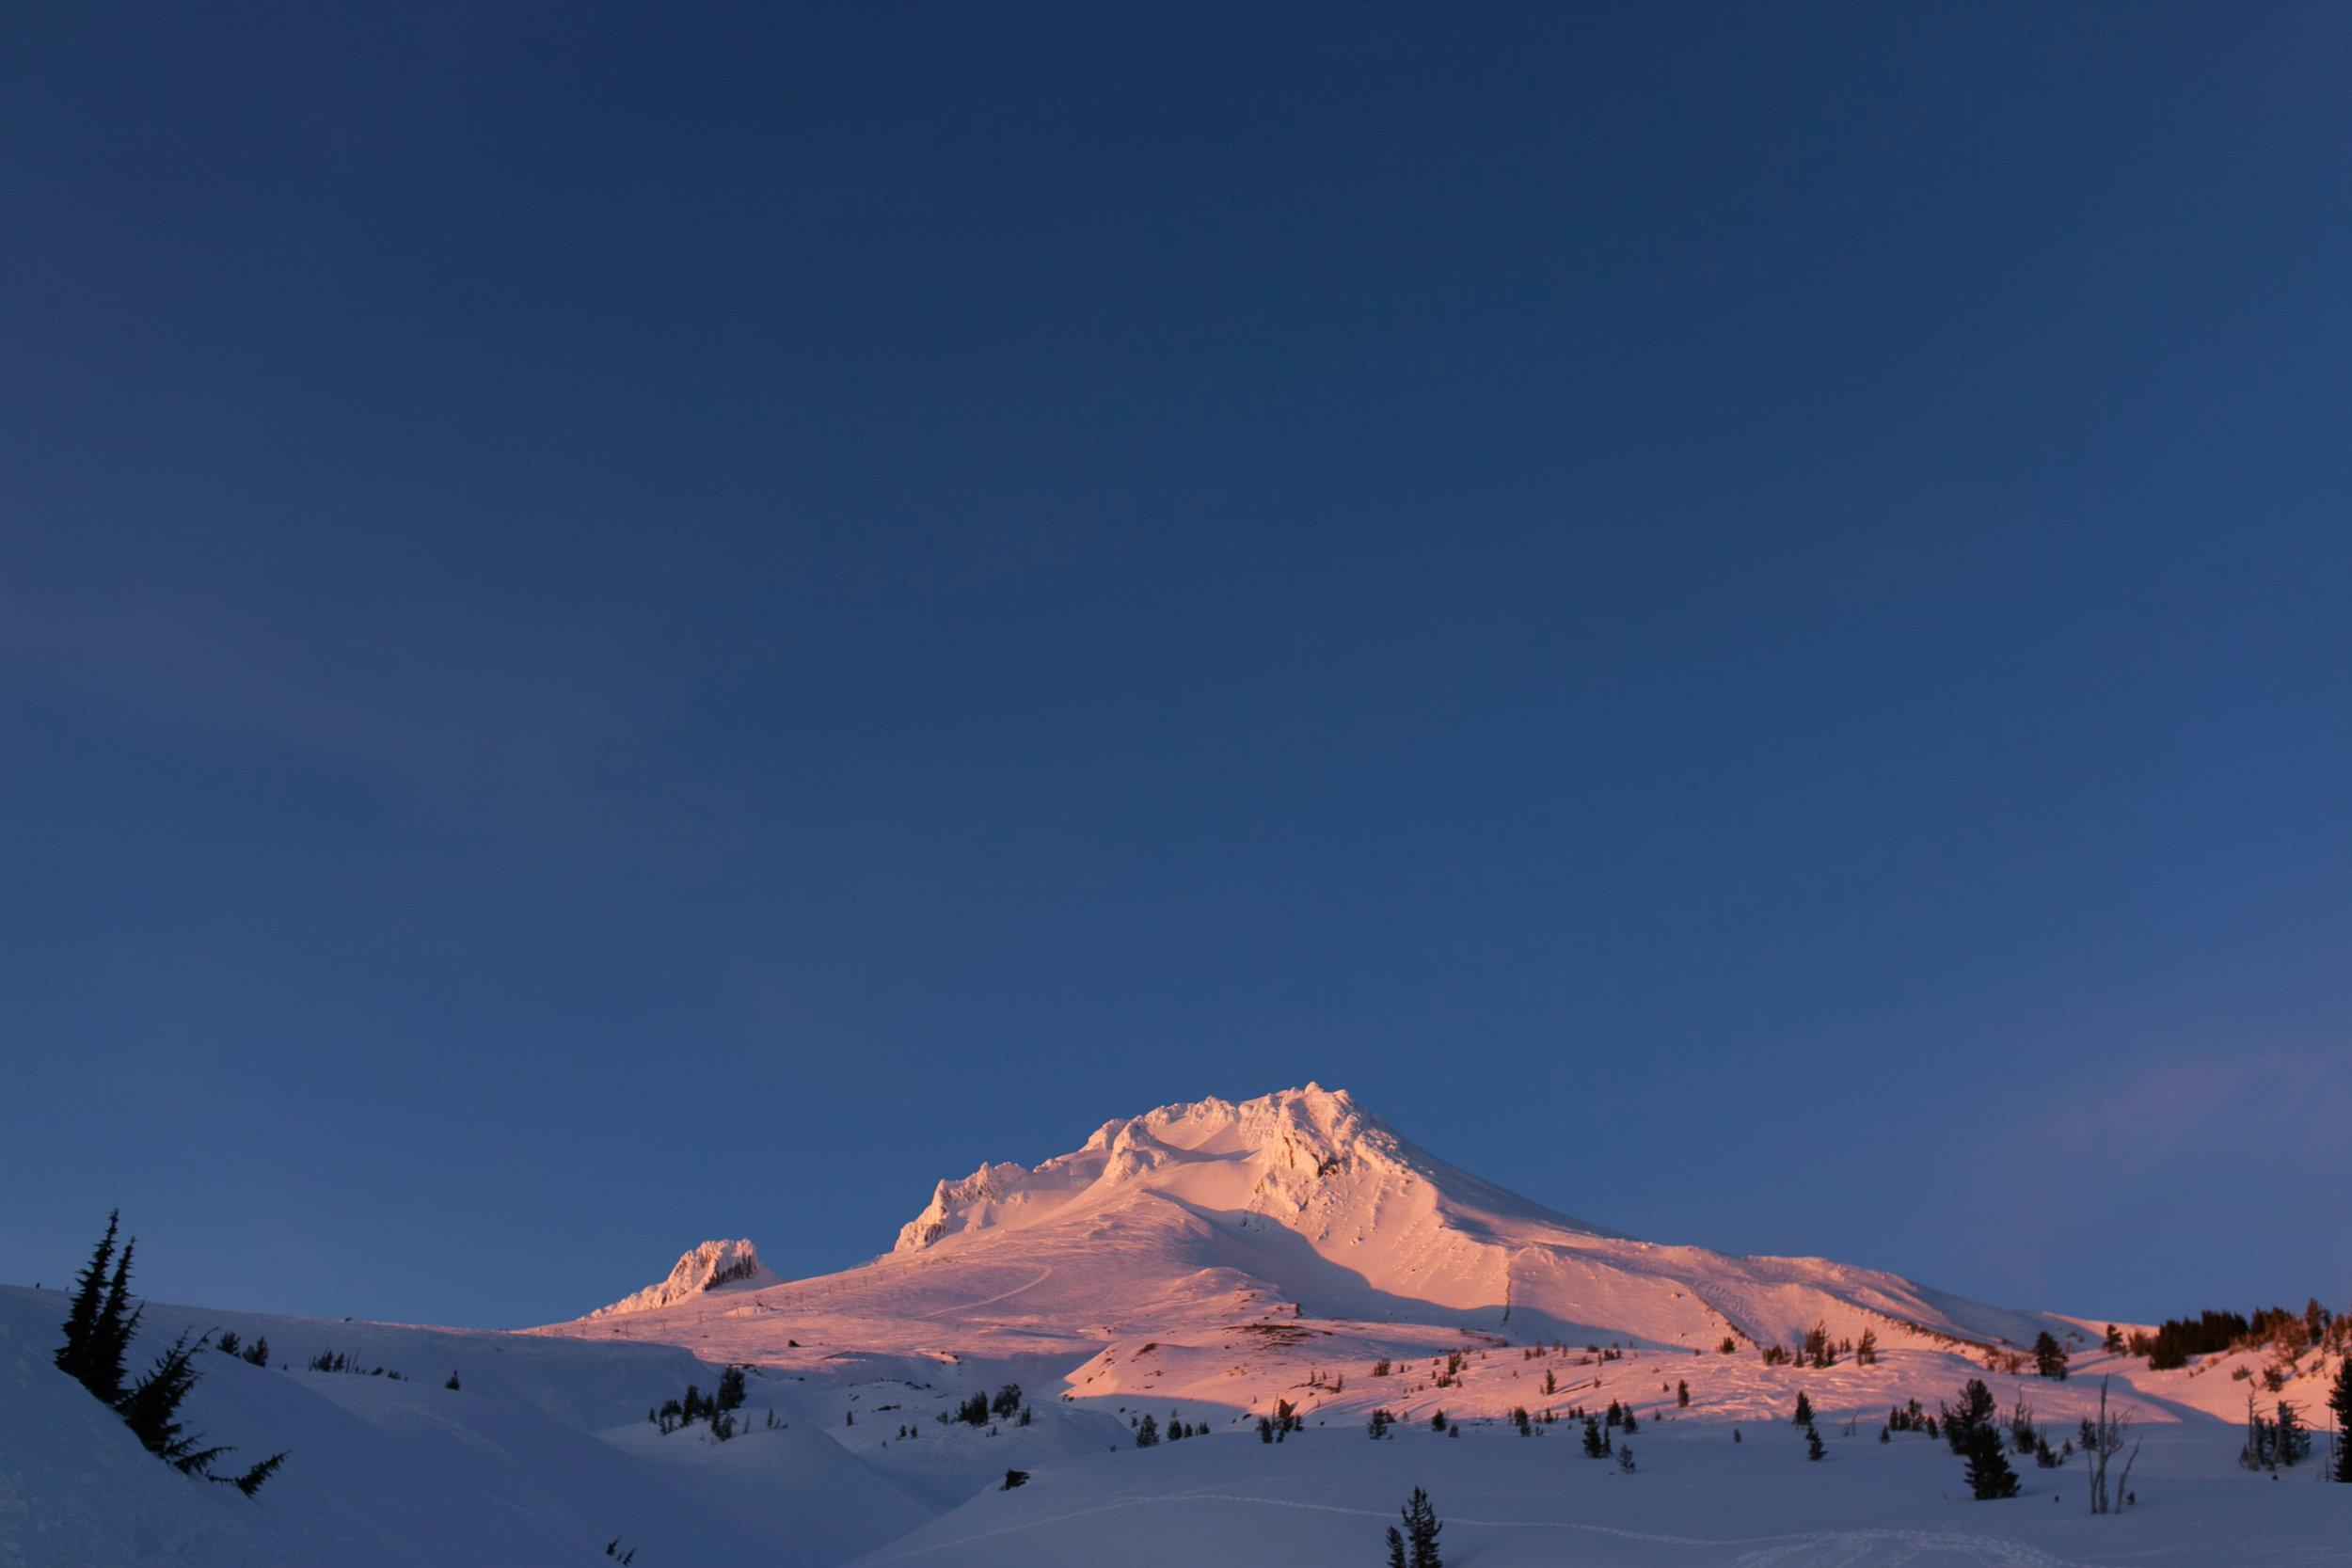 031Travel_Adventure_Photography_Outlive_Creative_Oregon_Mount_Hood.jpg